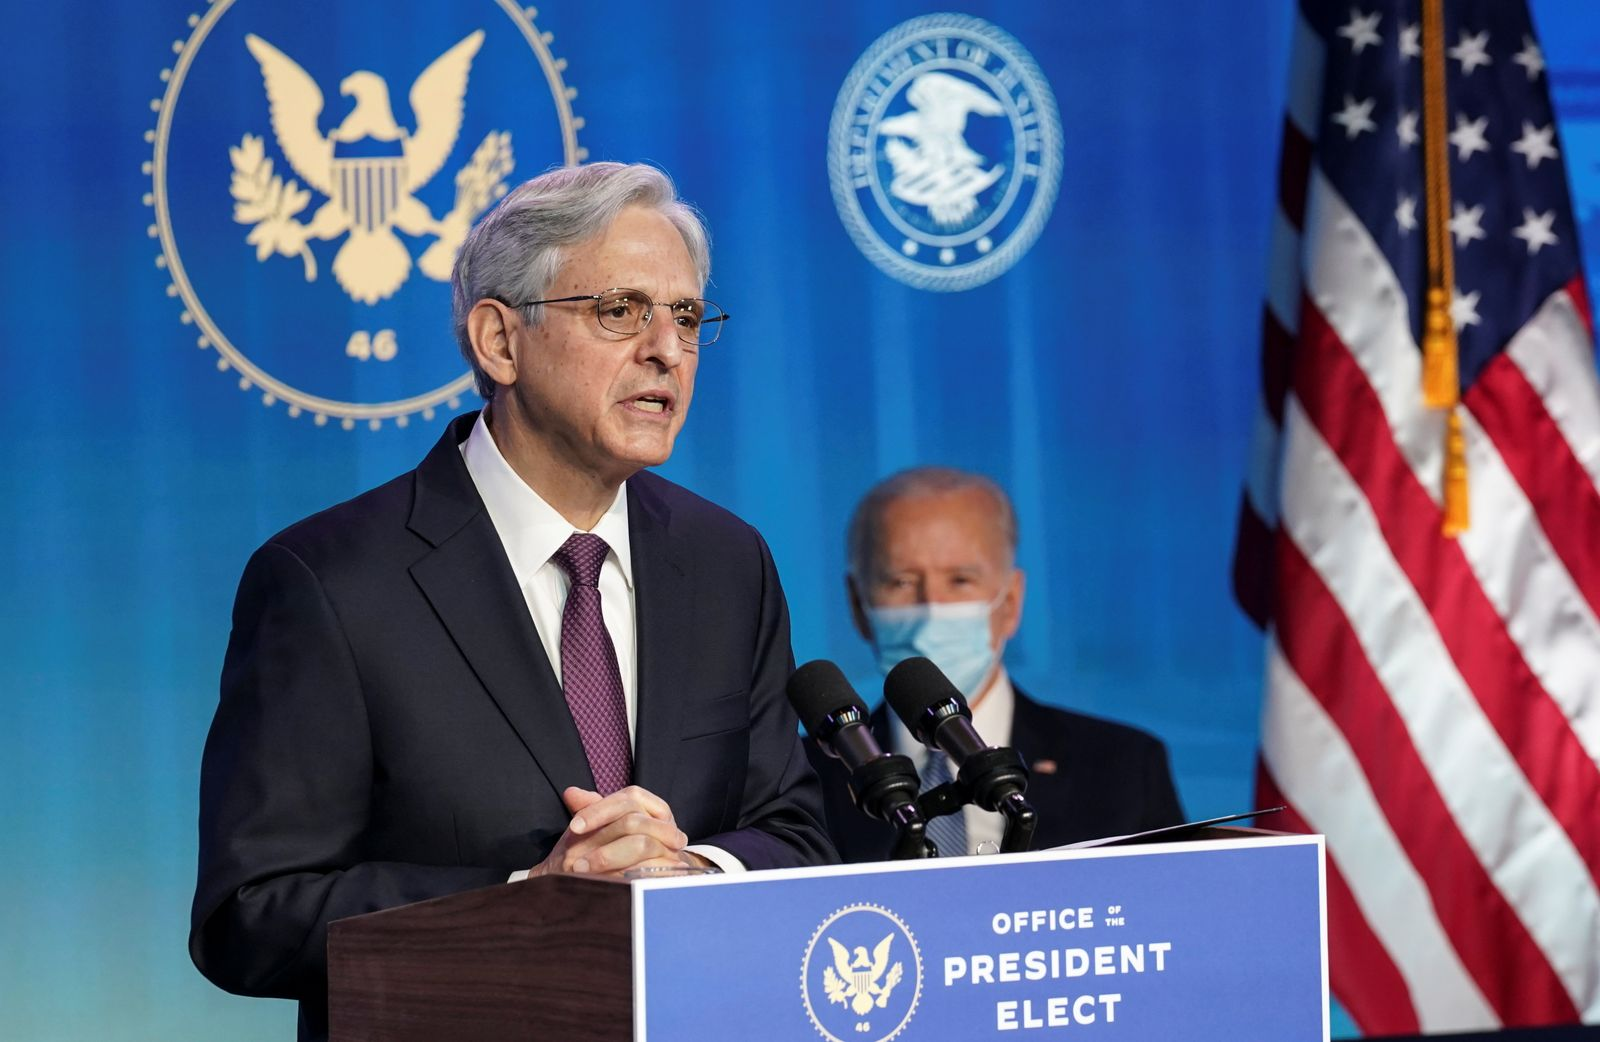 U.S. President-elect Joe Biden announces Justice Department nominees at his transition headquarters in Wilmington, Delaware